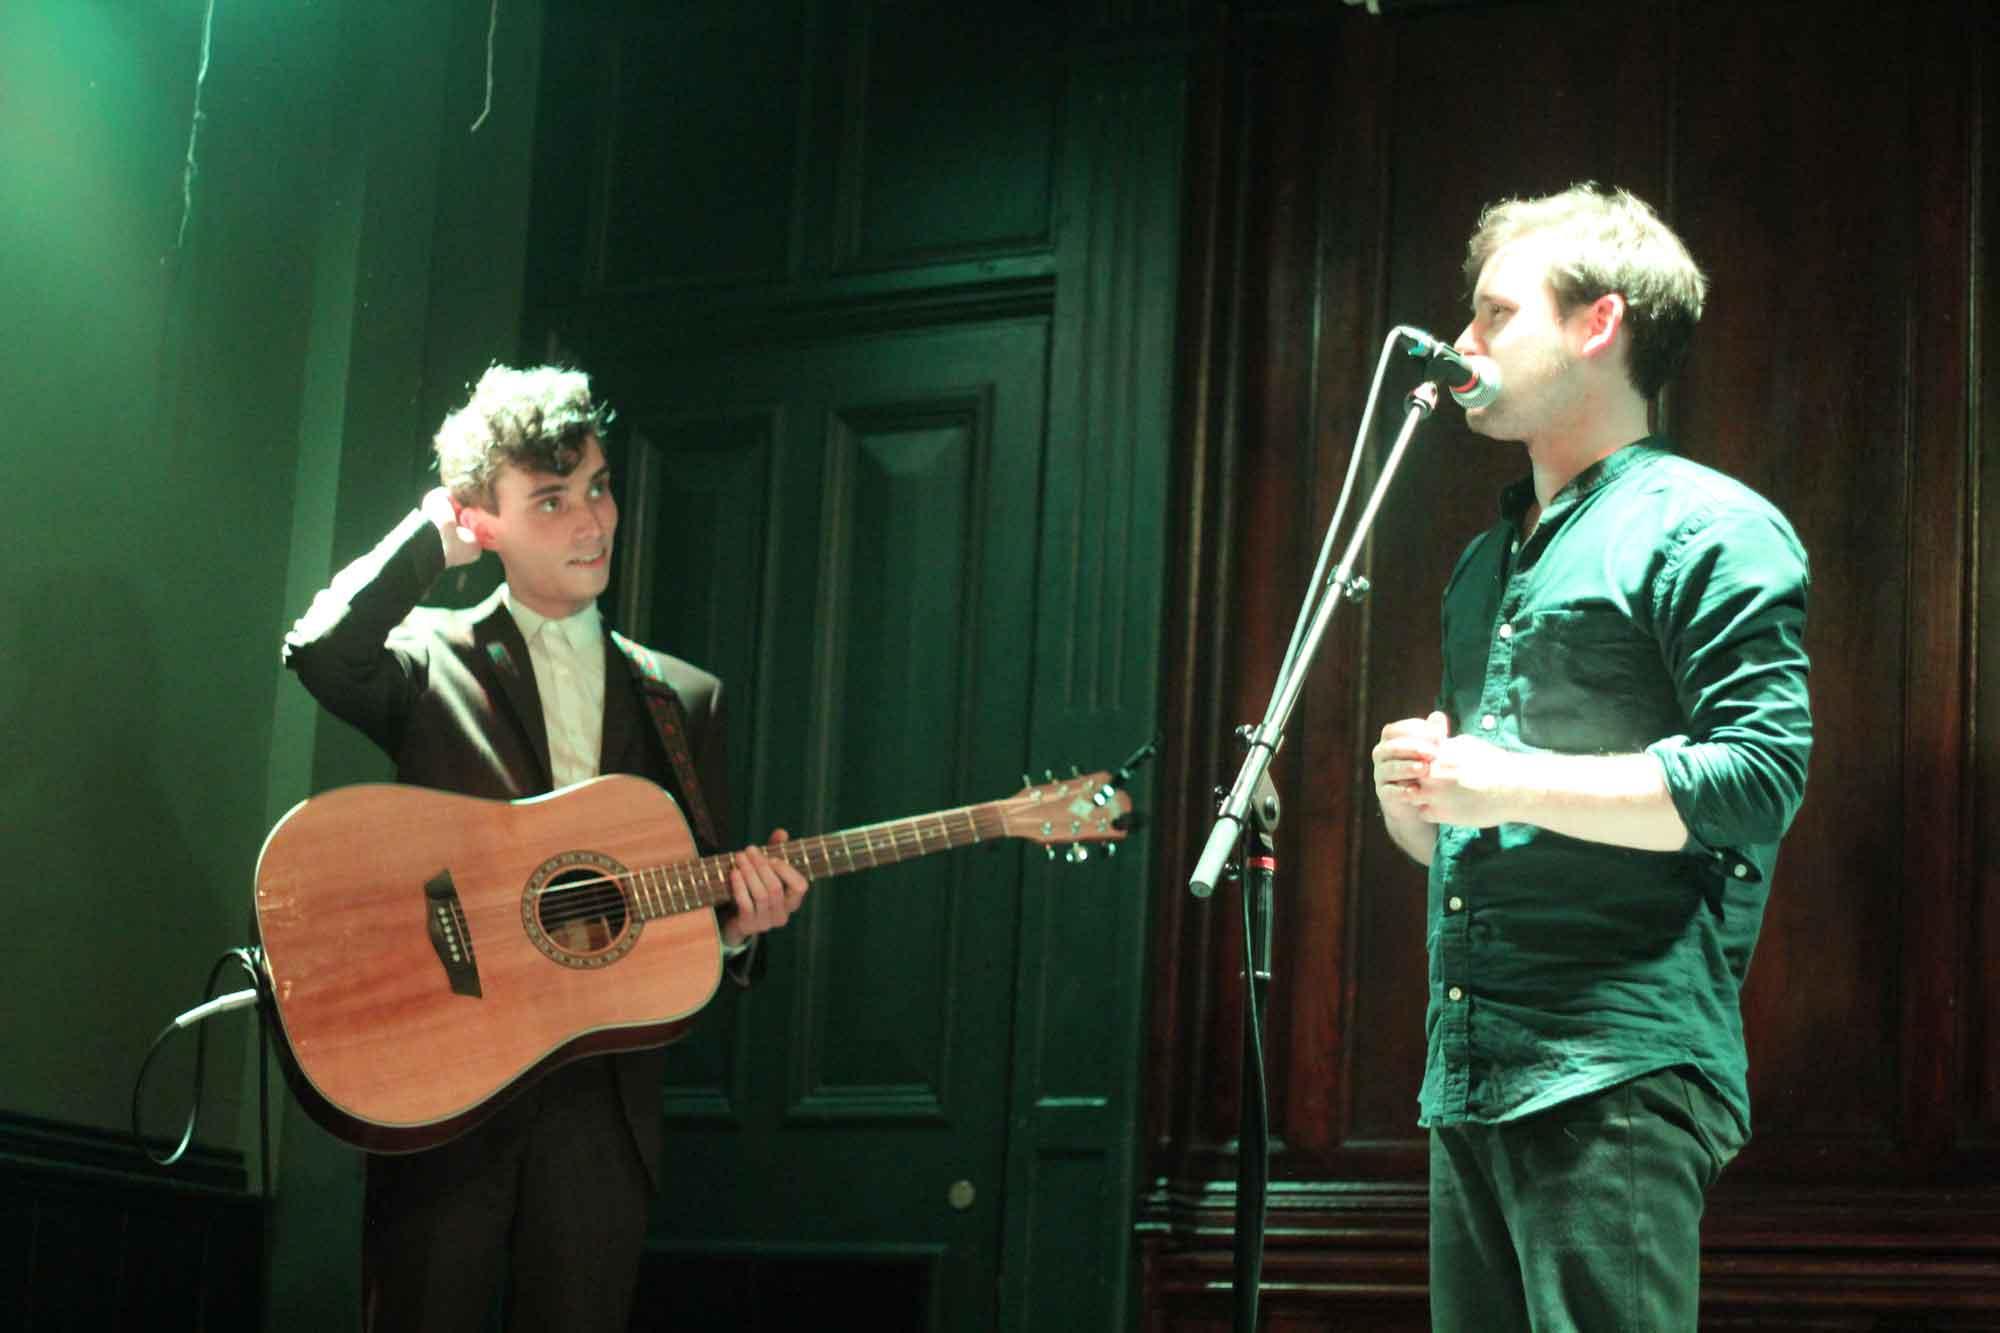 Thom Morecroft Introduces Chris Tavener Live In Manchester